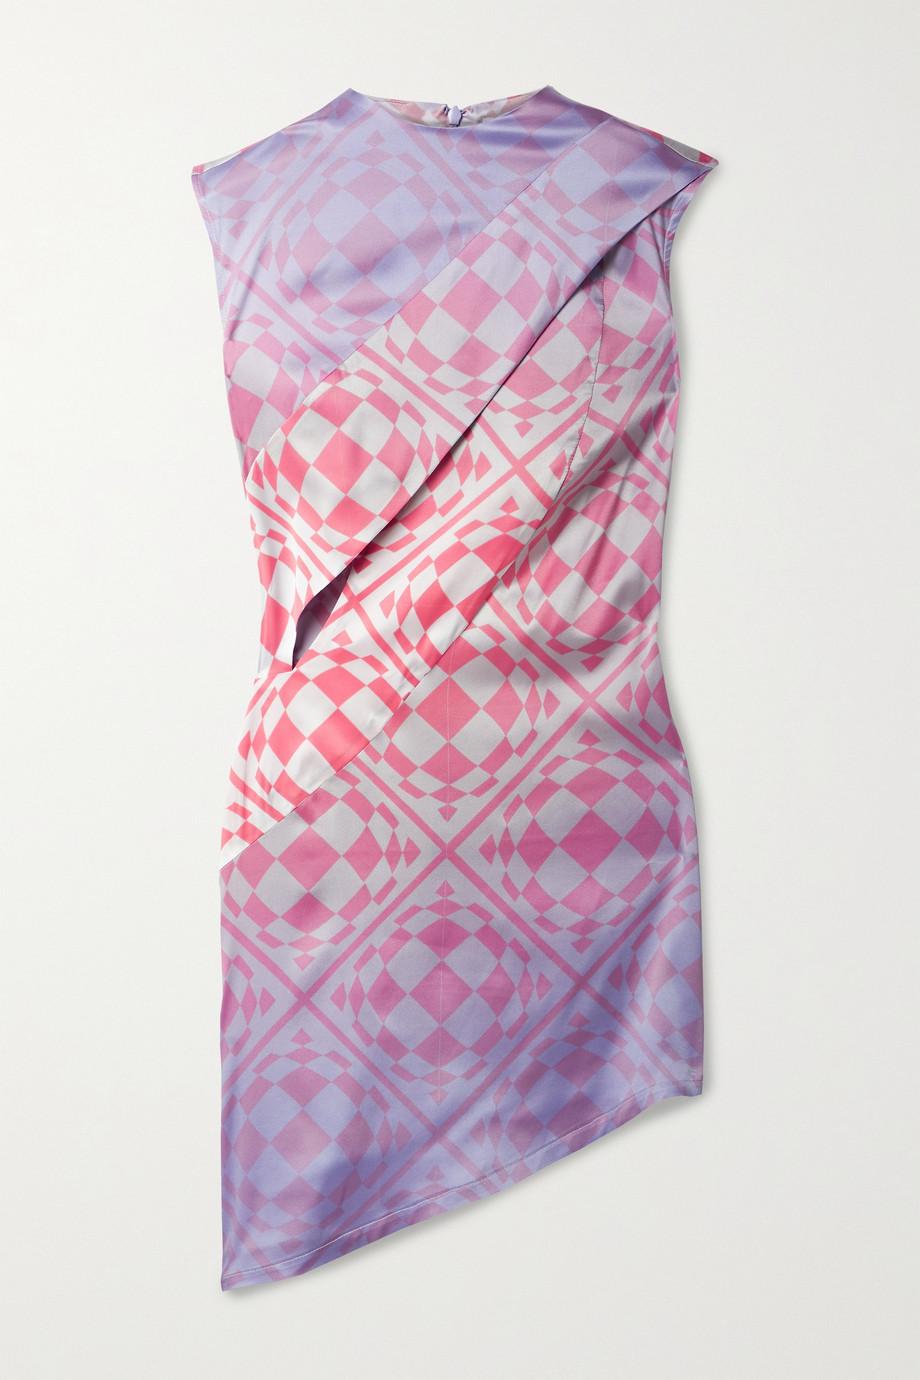 Maisie Wilen Cat Eye asymmetric printed stretch silk-satin mini dress